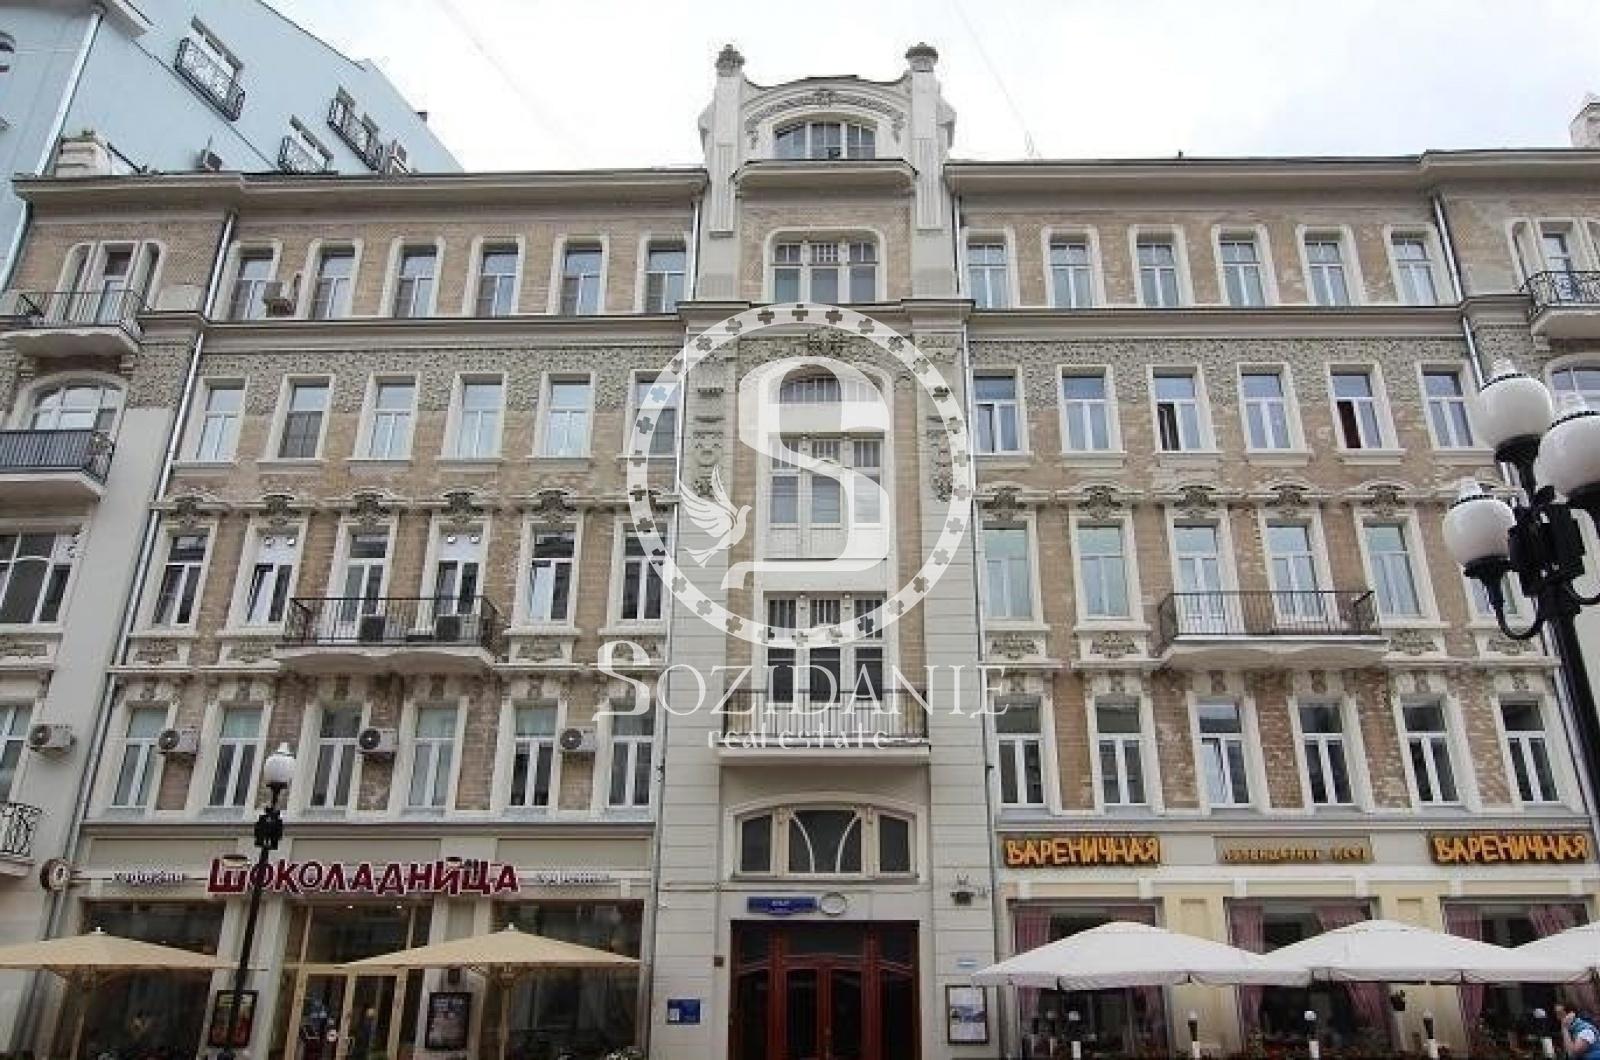 4 Комнаты, Городская, Аренда, Улица Арбат, Listing ID 3584, Москва, Россия,